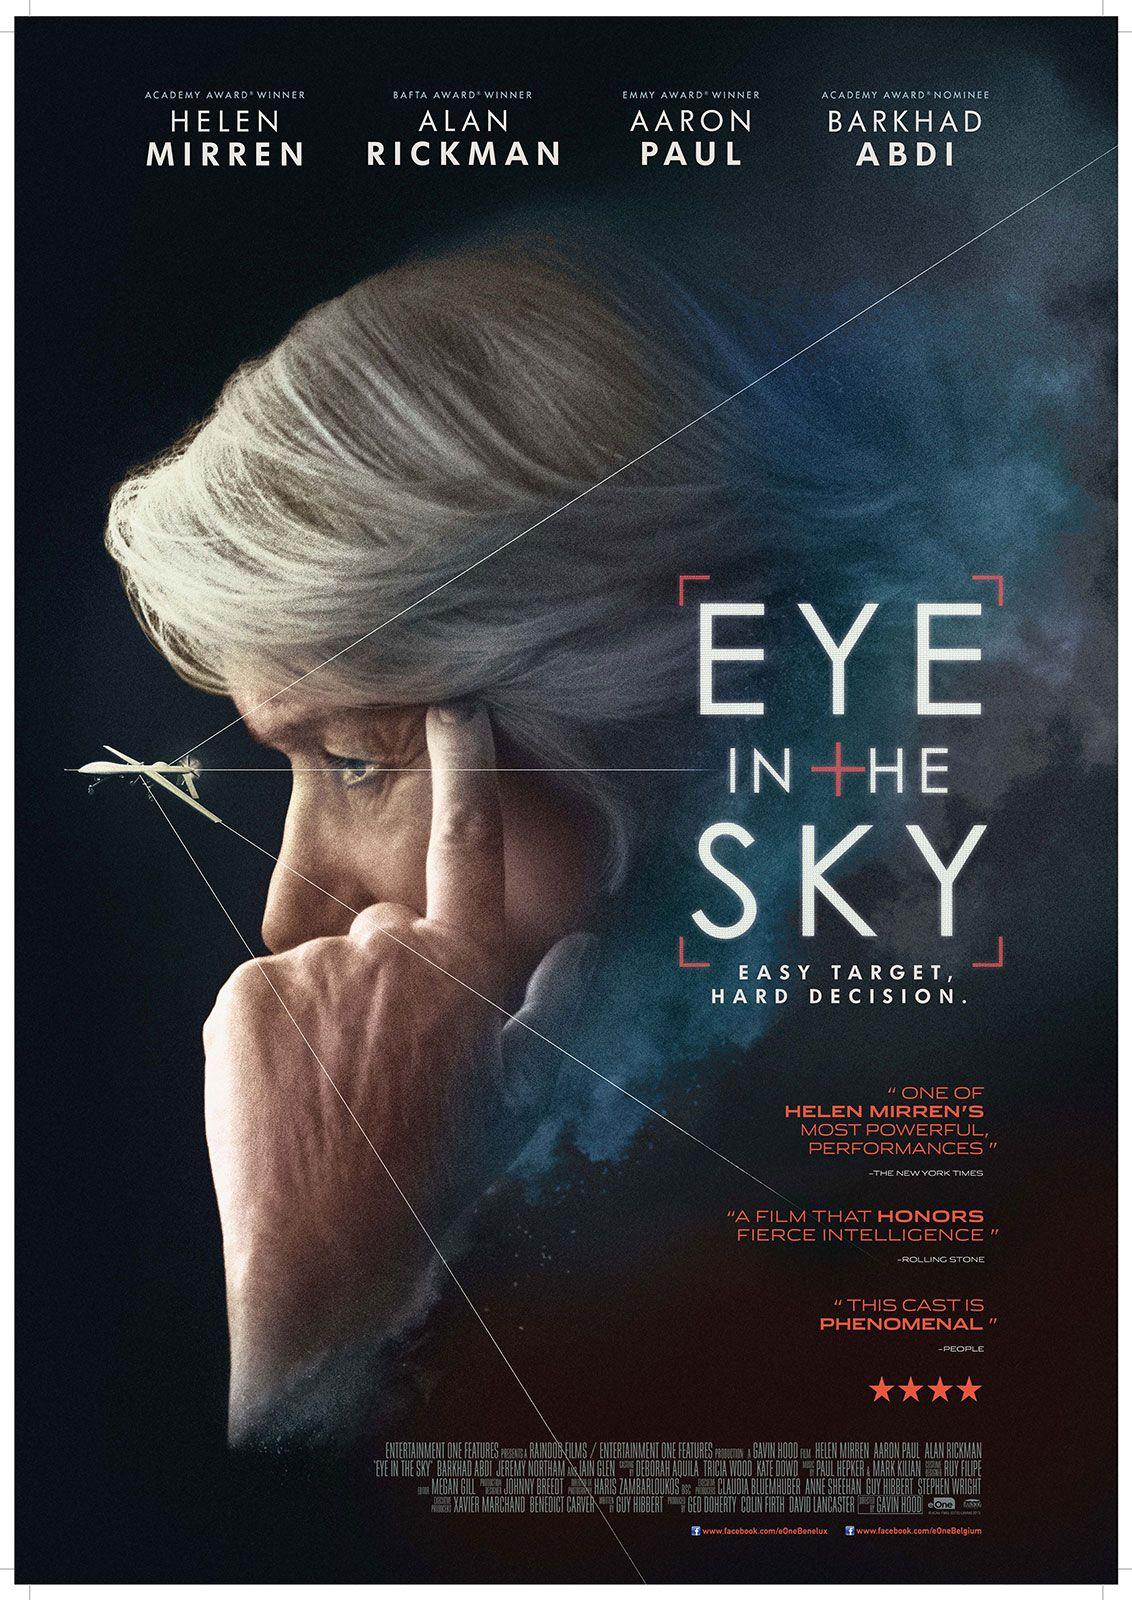 Eye In The Sky 2015 Helen Mirren Filmposters Film